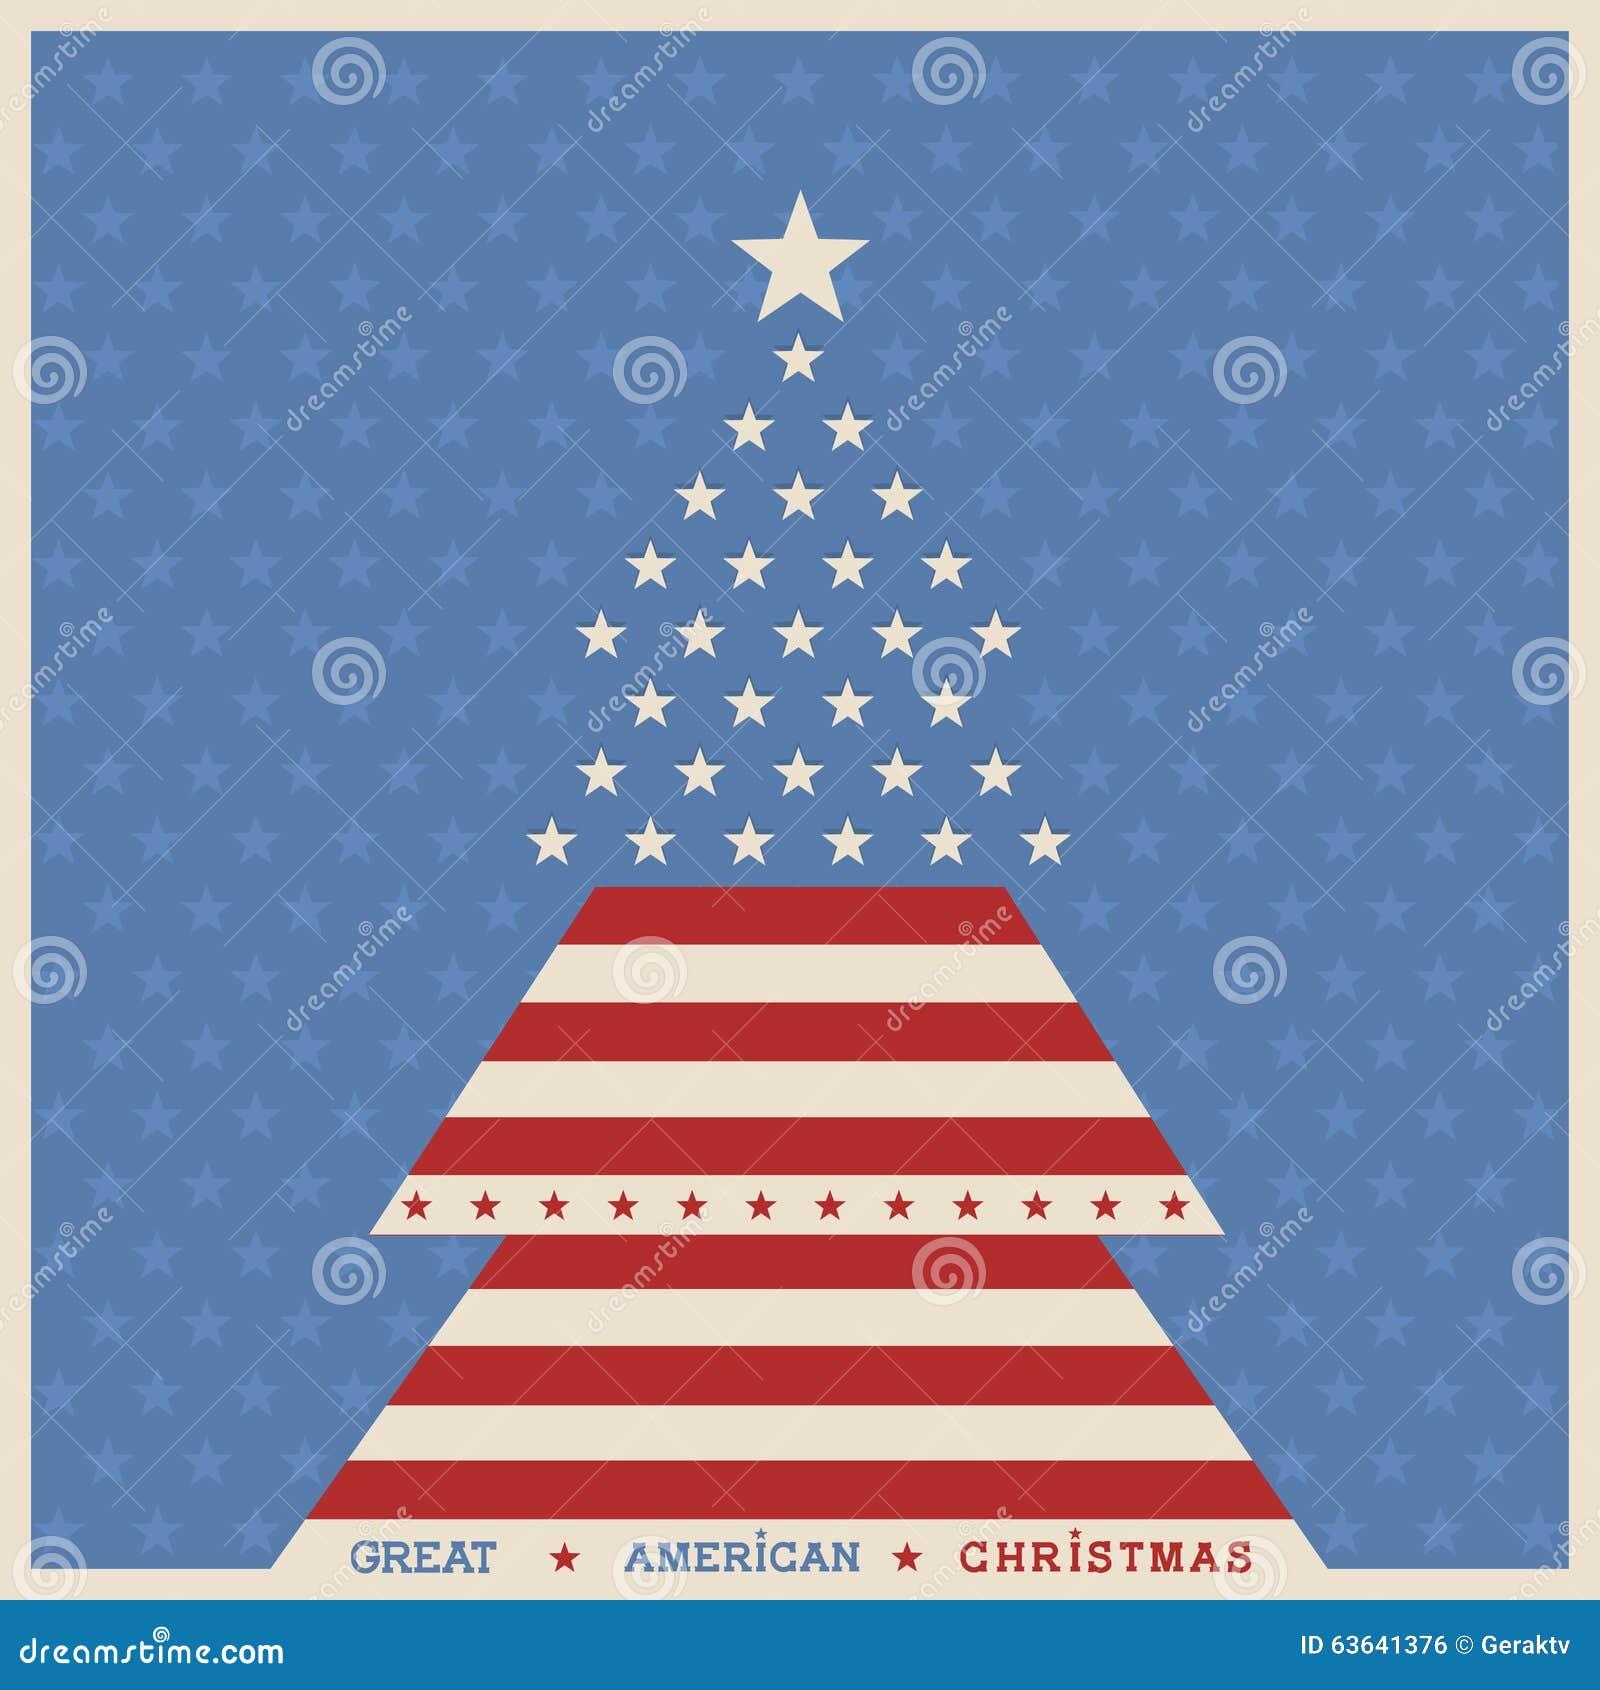 american christmas tree poster background - American Christmas